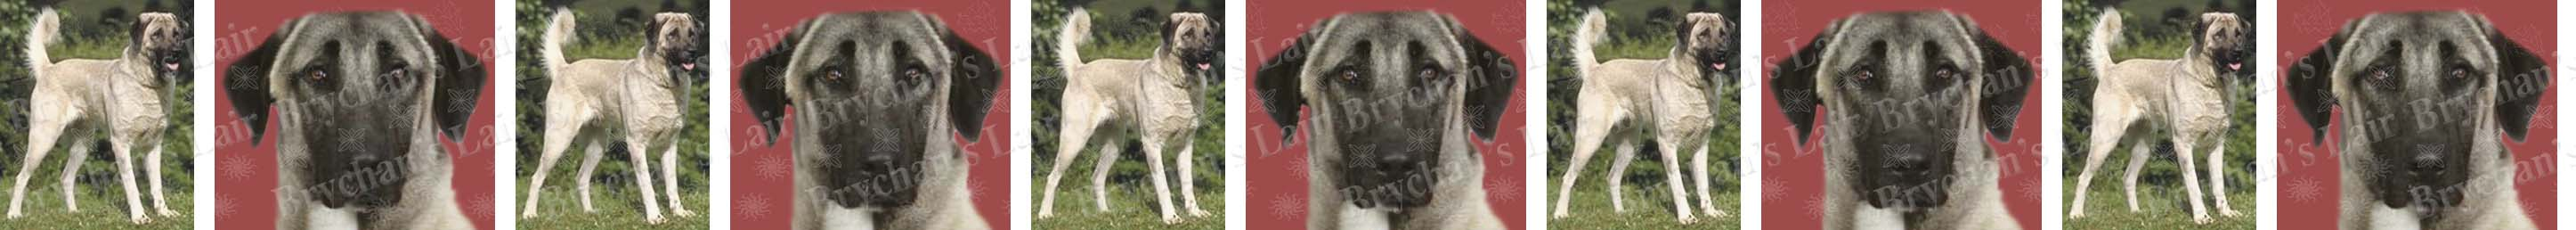 Anatolian Shepherd Dog Breed Custom Printed Grosgrain Ribbon